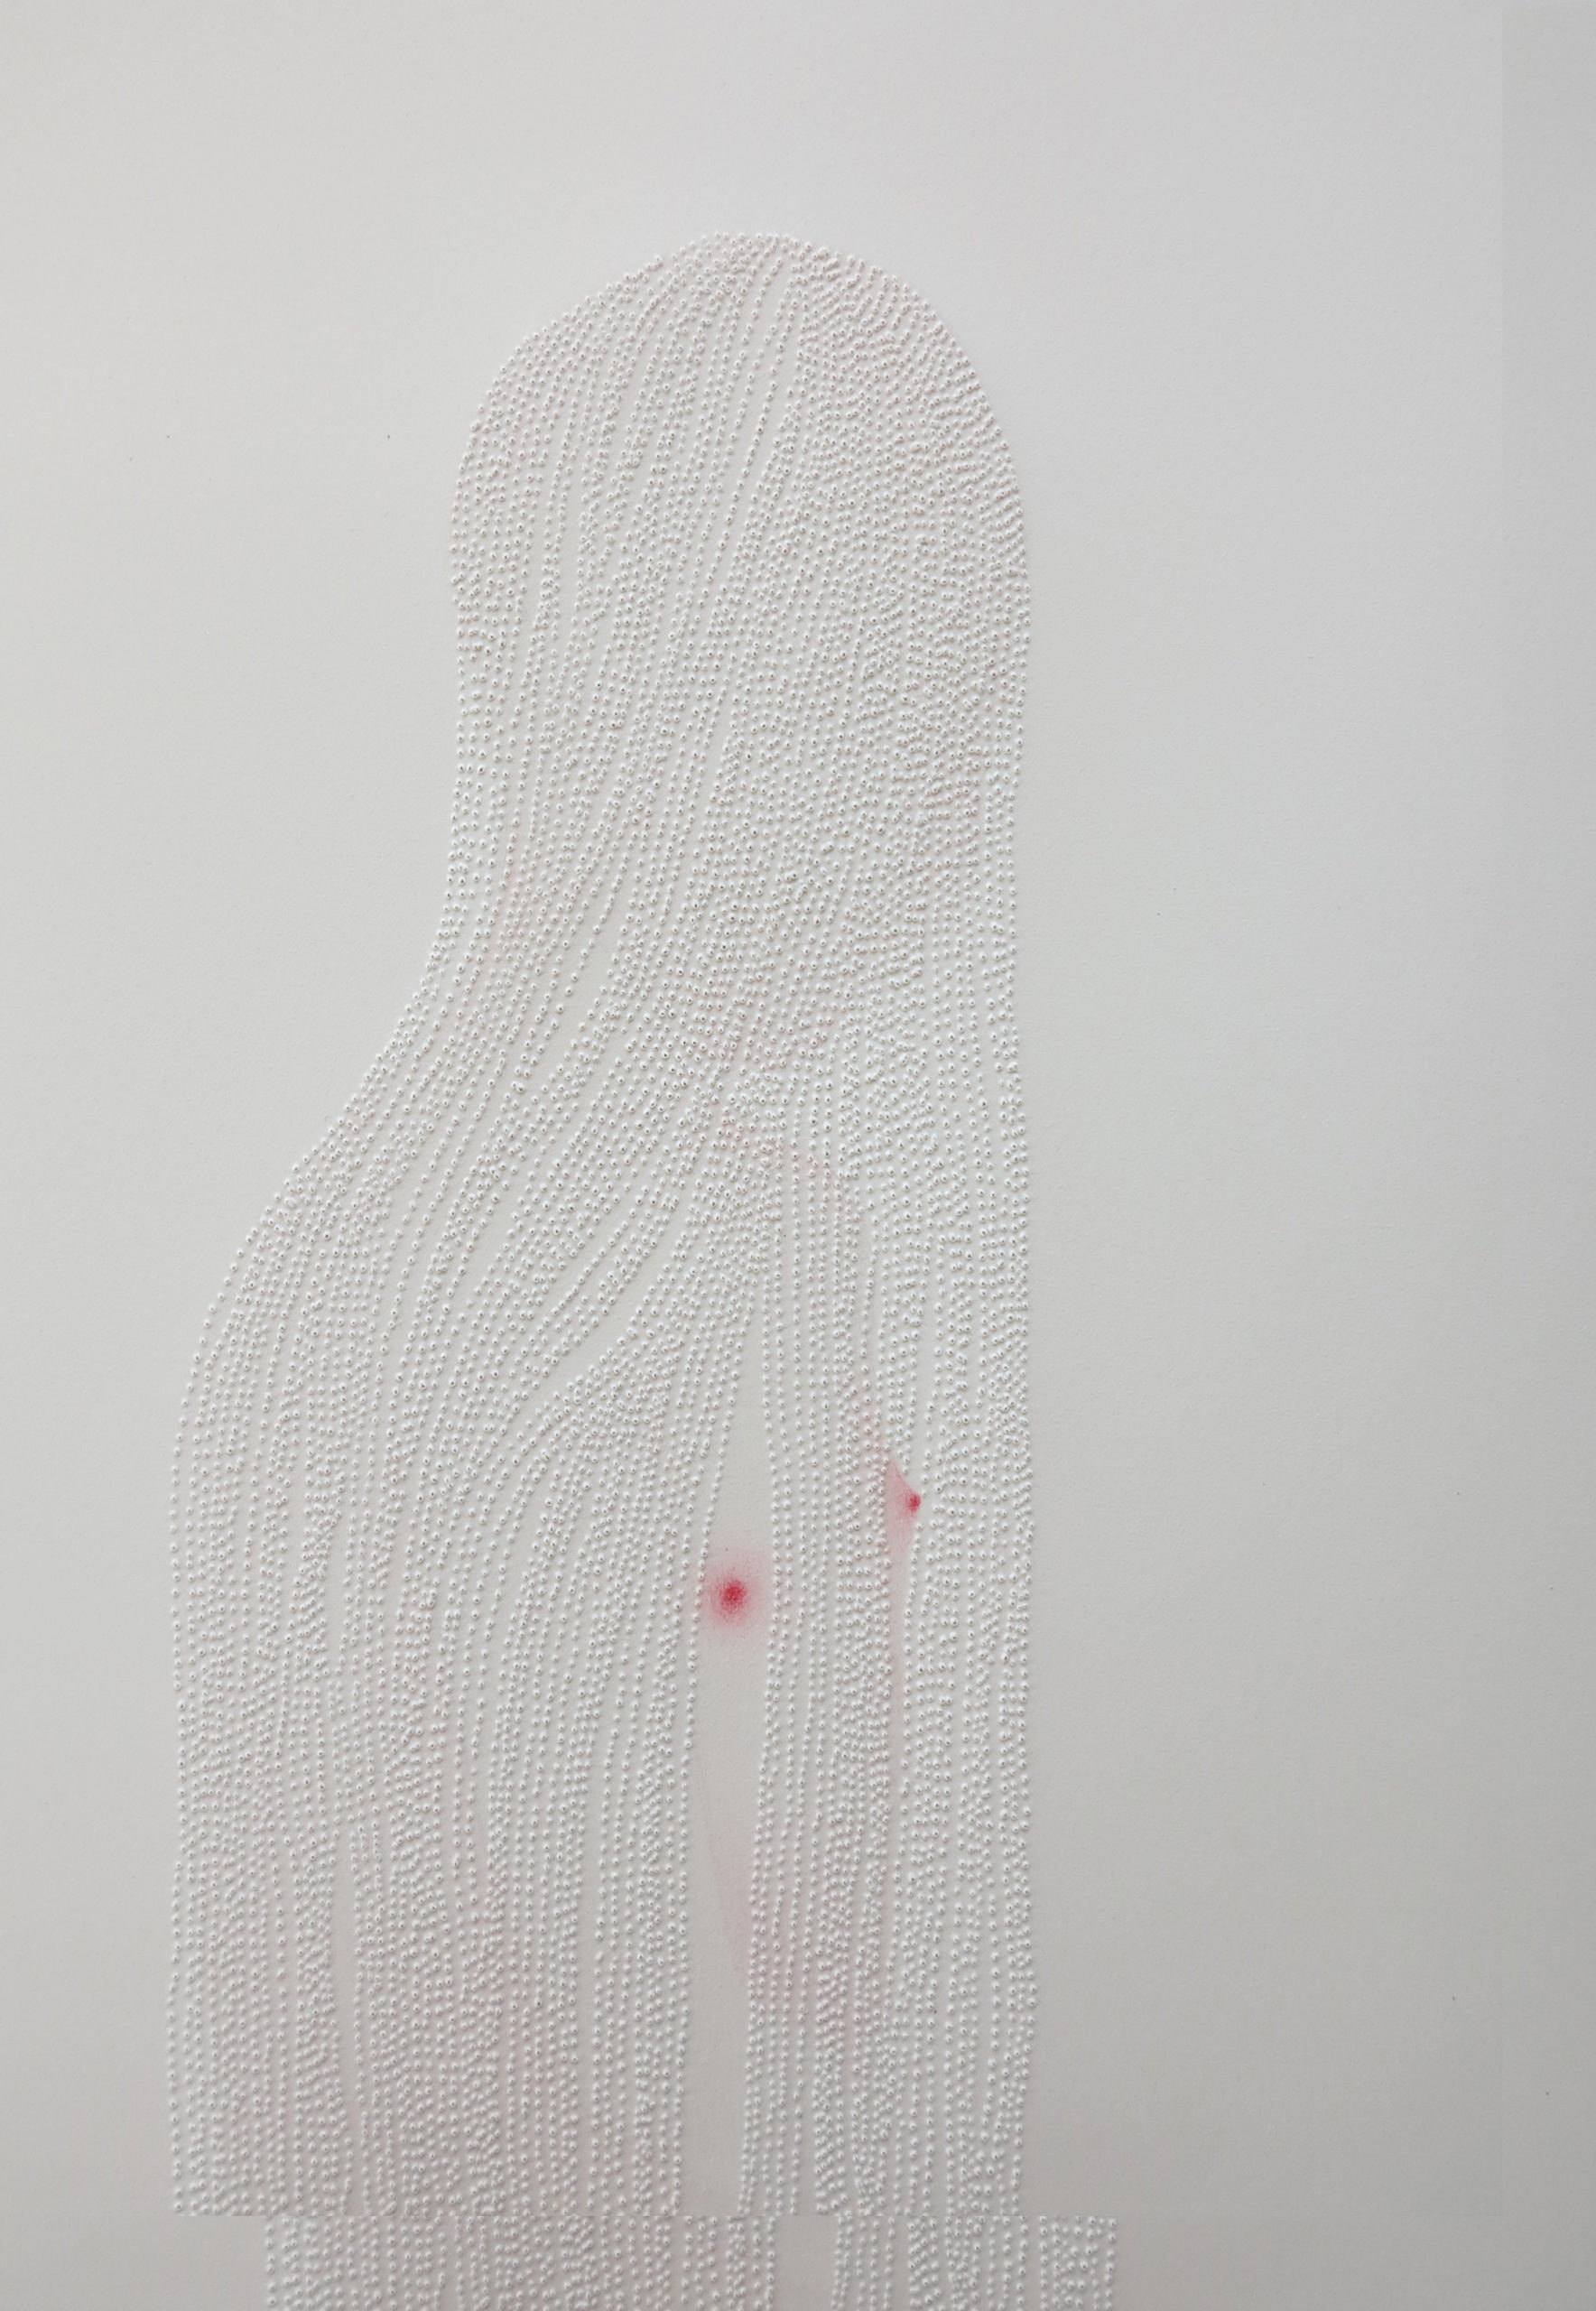 Marielle Degioanni, Série Idoles, Untitled, 2018.